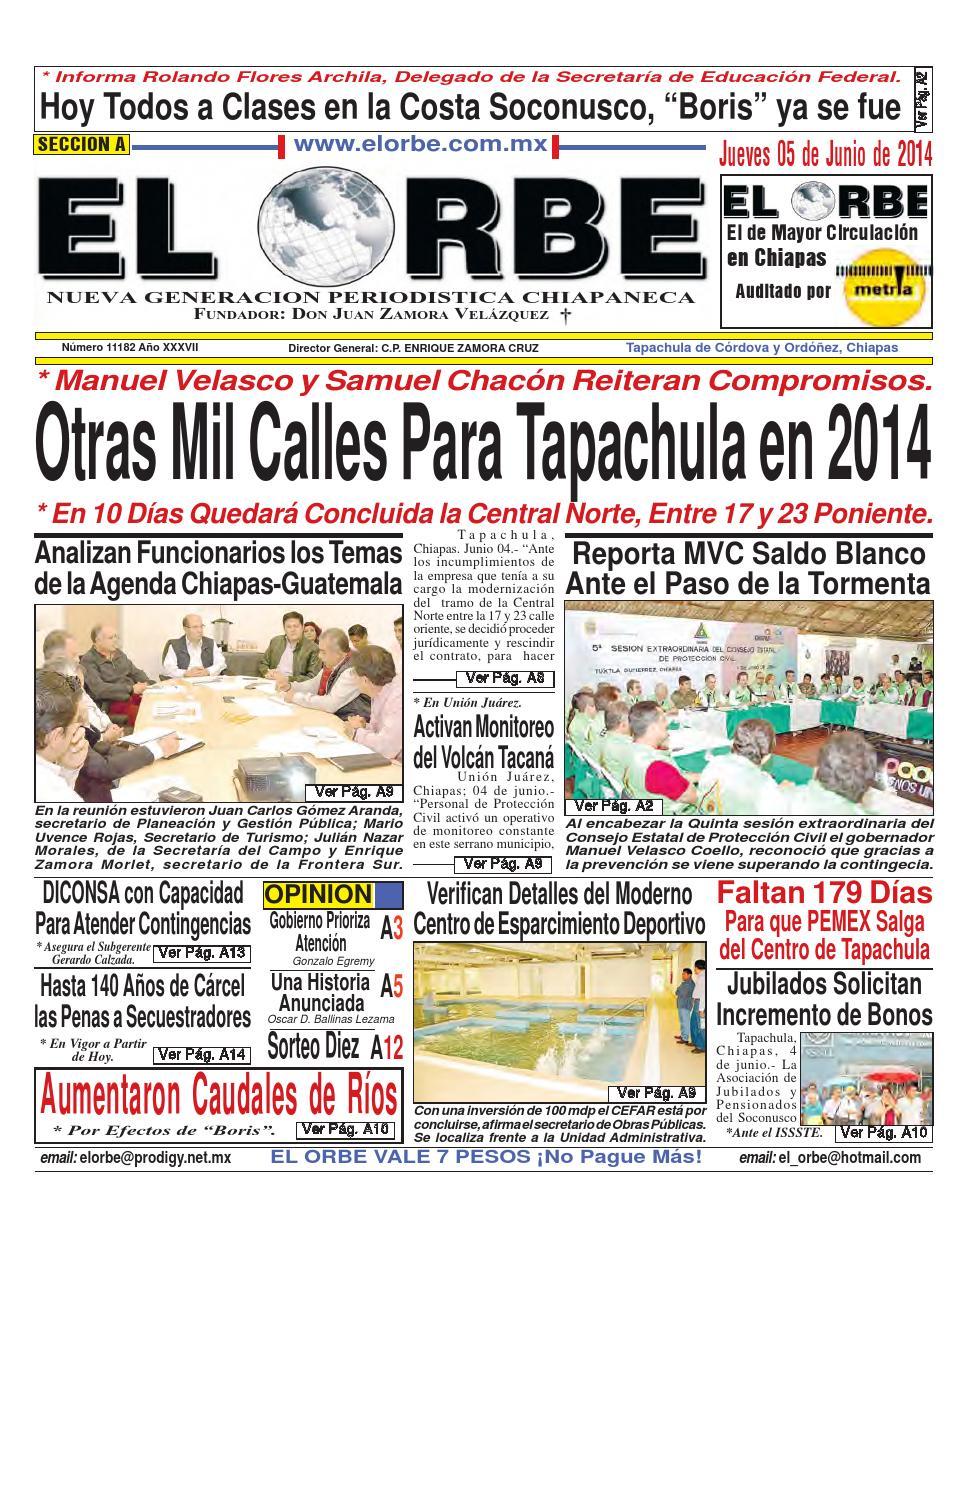 Super ball loteria opiniones tragaperra El padrino - 92995